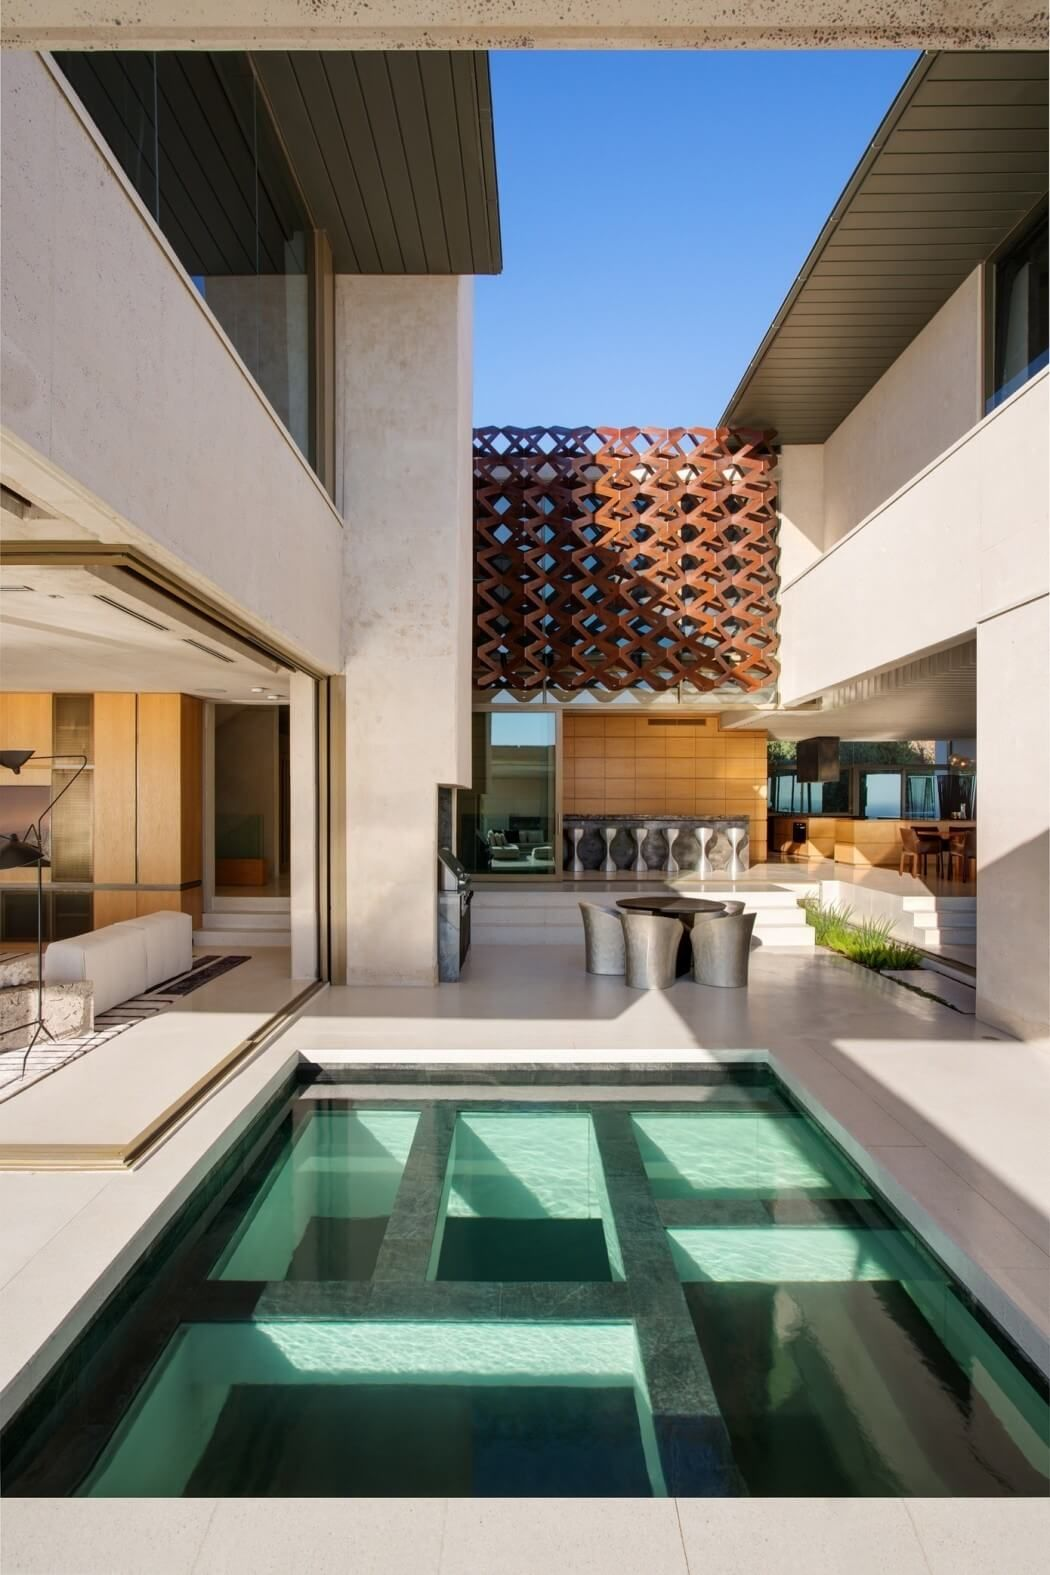 ovd 919 by saota modern home design interior pools house